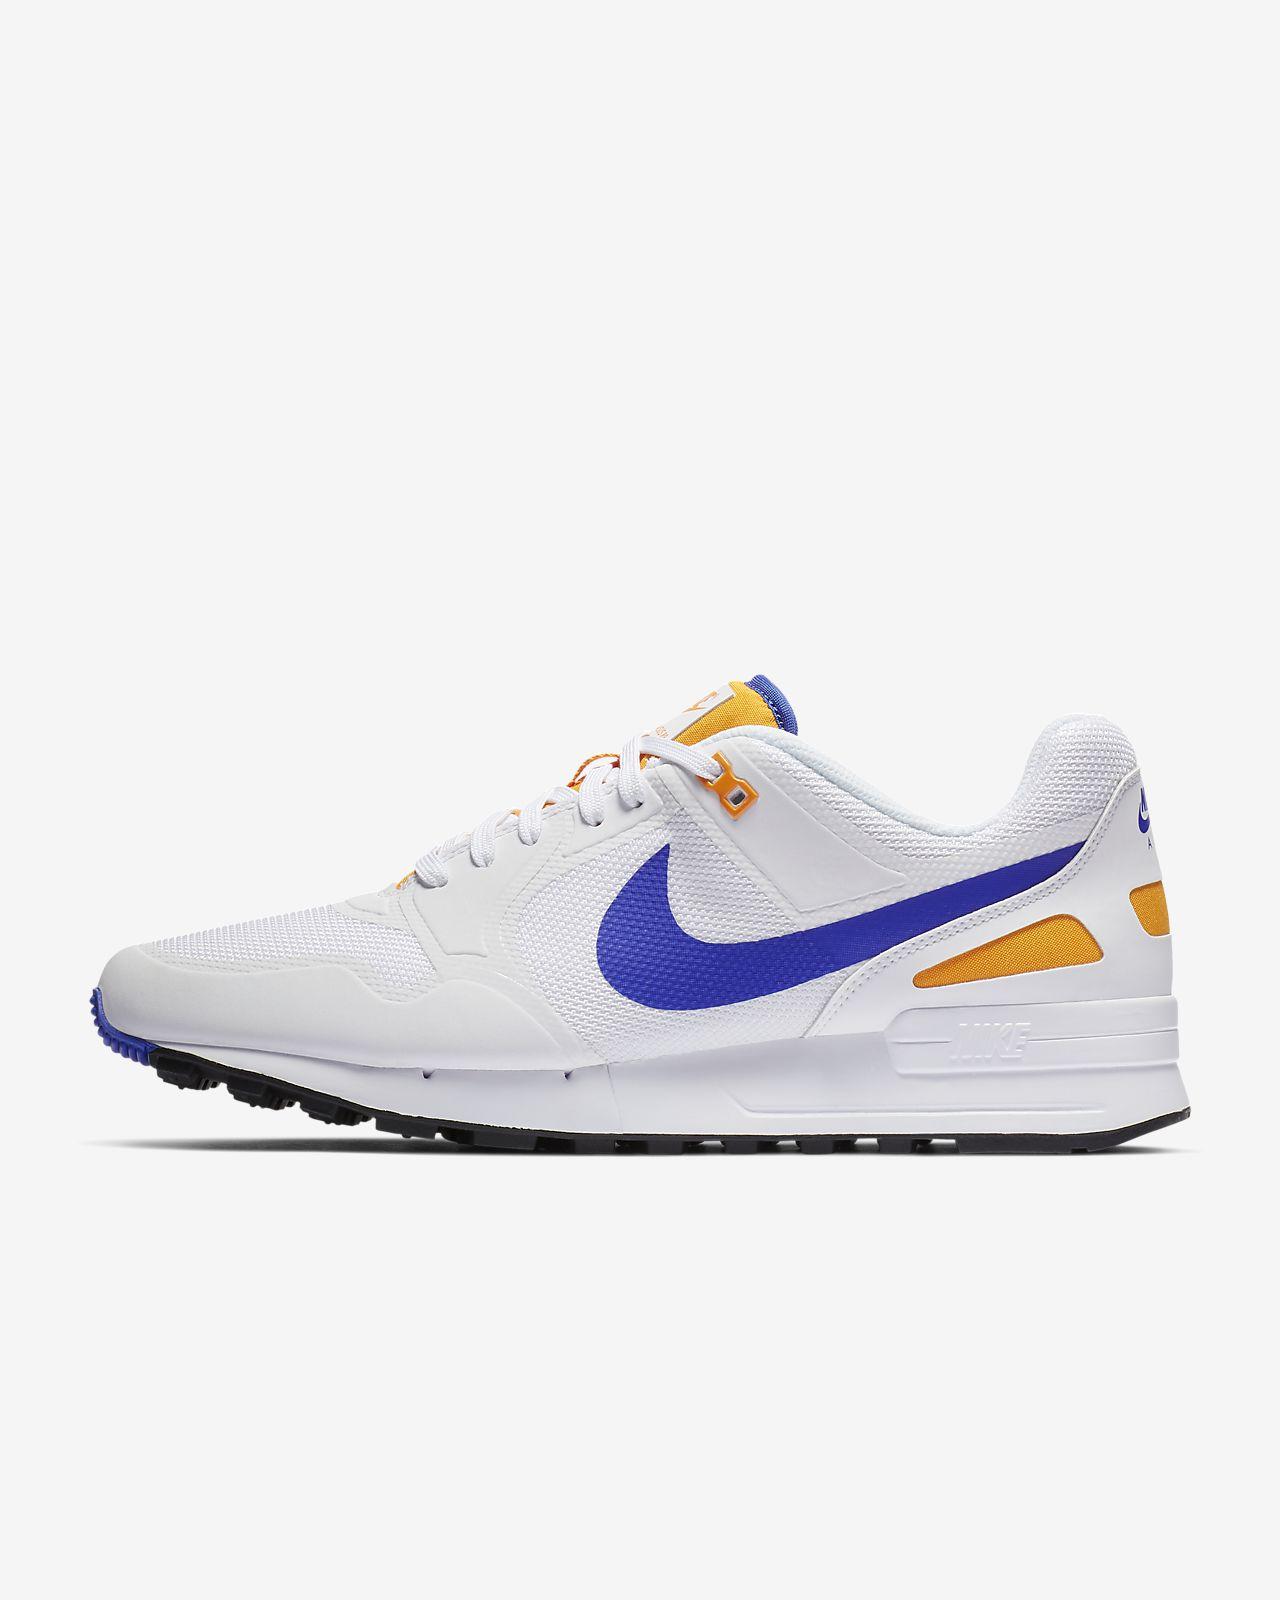 half off 463b7 92139 ... Chaussure Nike Air Pegasus 89 pour Homme